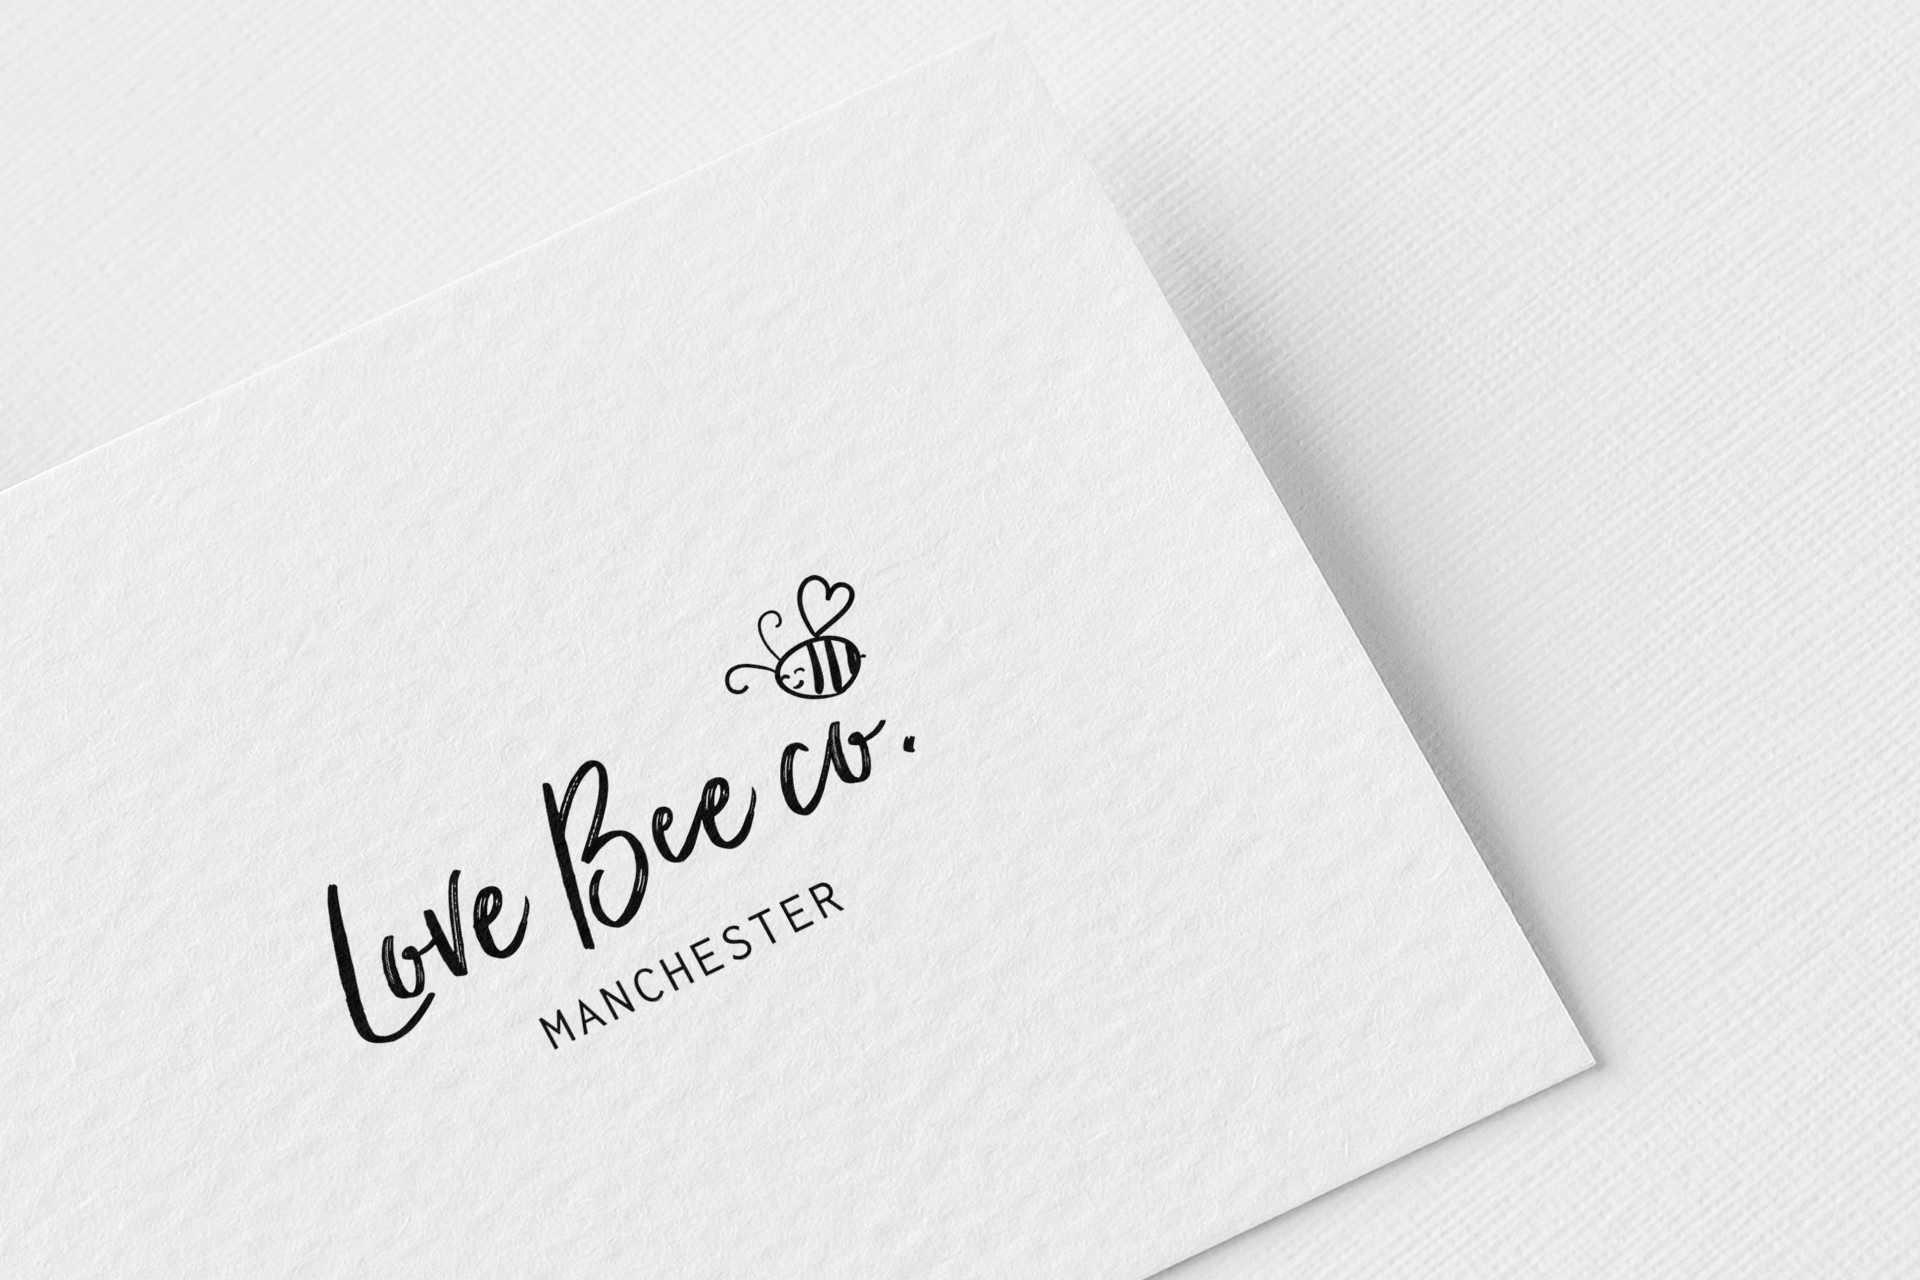 pixel-perfect-warrington-love-bee-logo-design